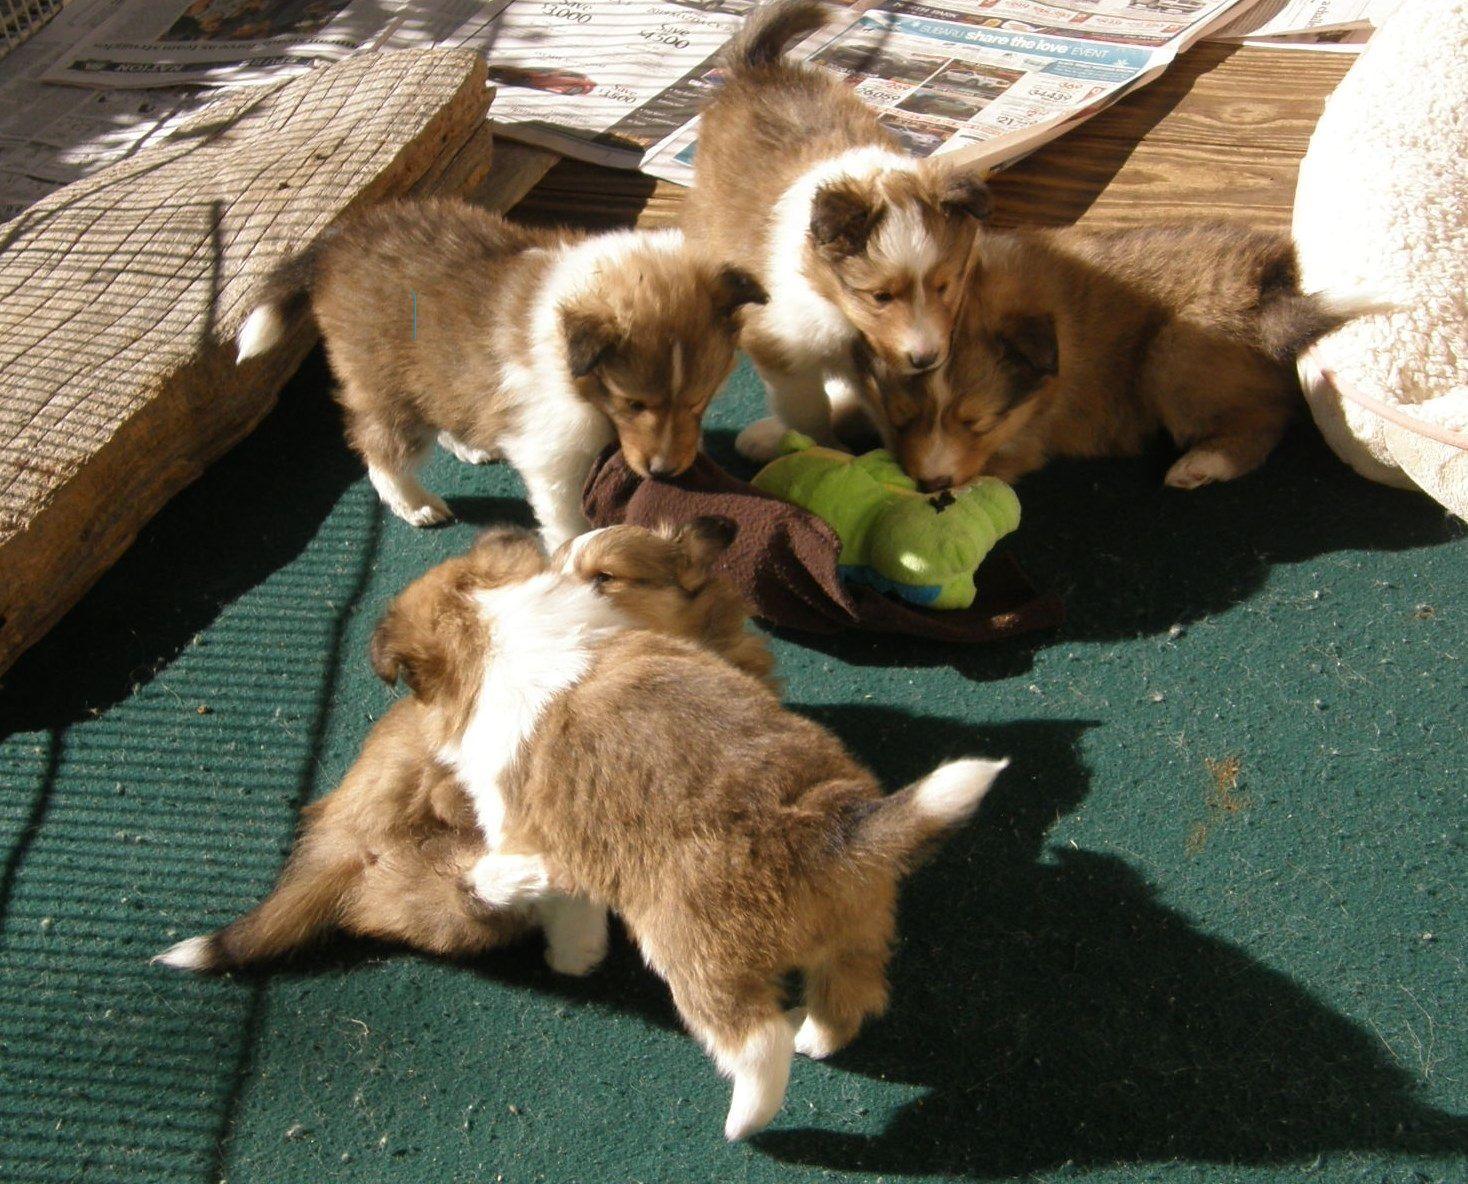 Texas Sheltie Breeders Sheltie Pups Shetland Sheepdog Puppy Lockehill Shelties Puppy Page In 2020 Sheltie Puppy Shetland Sheepdog Puppies Sheltie